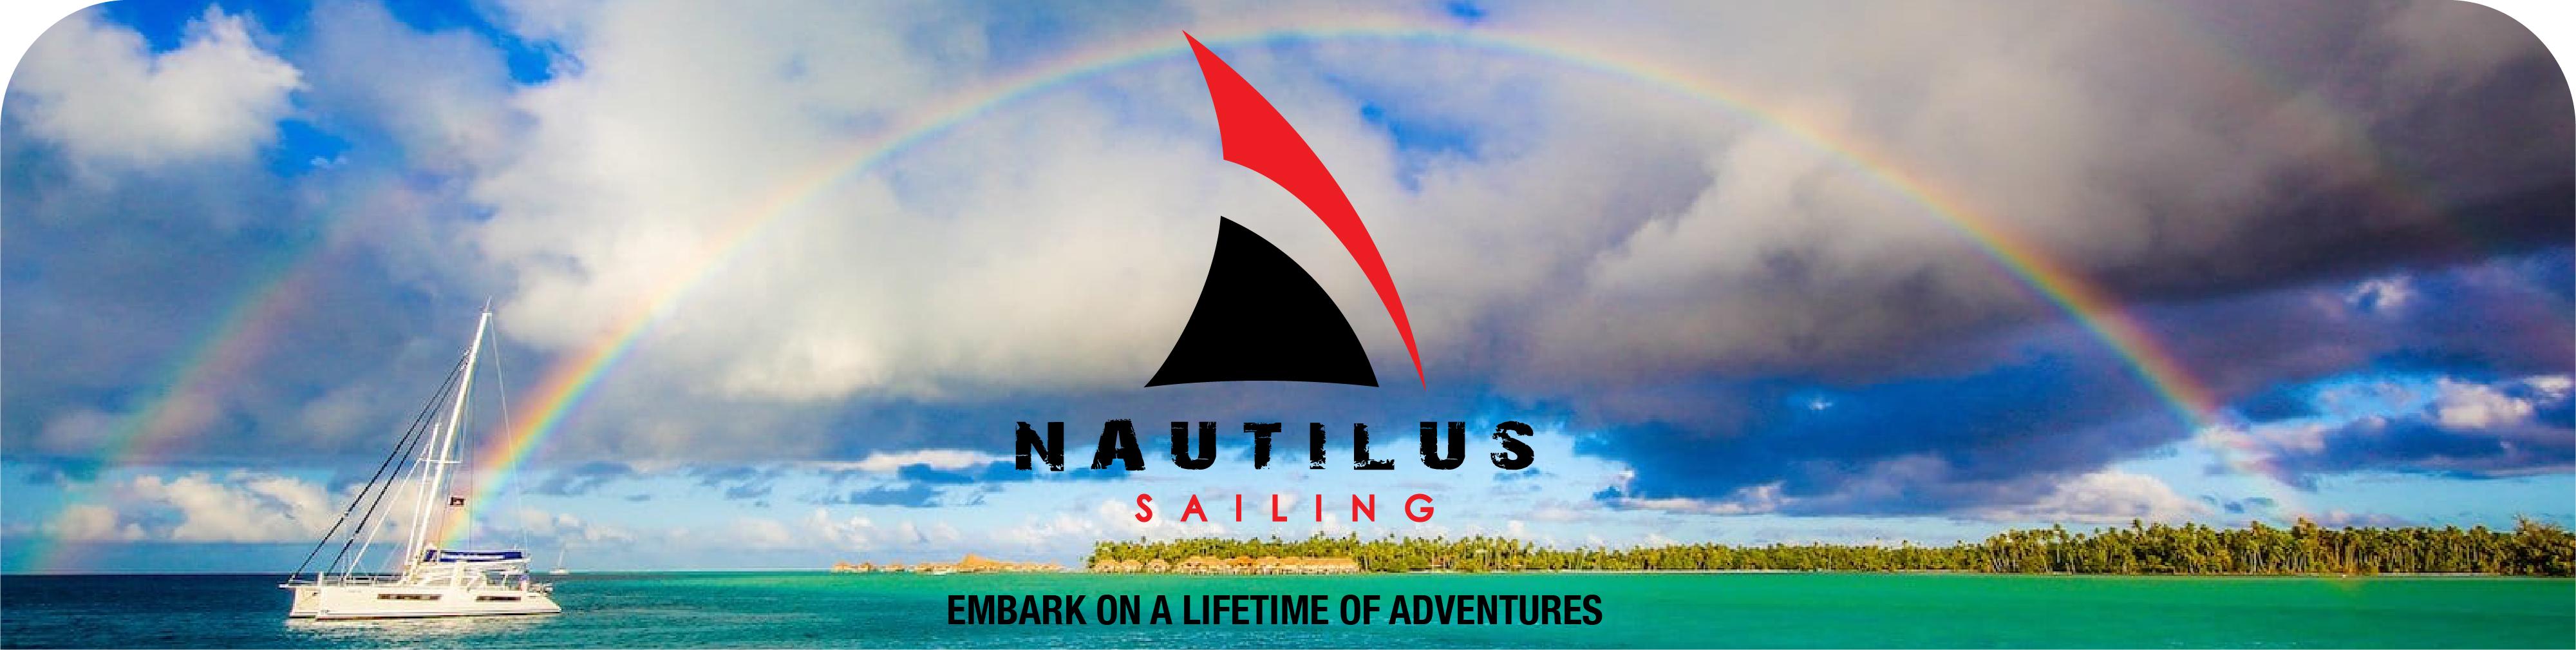 nautilus-sailing-online-store-banners-02.jpg